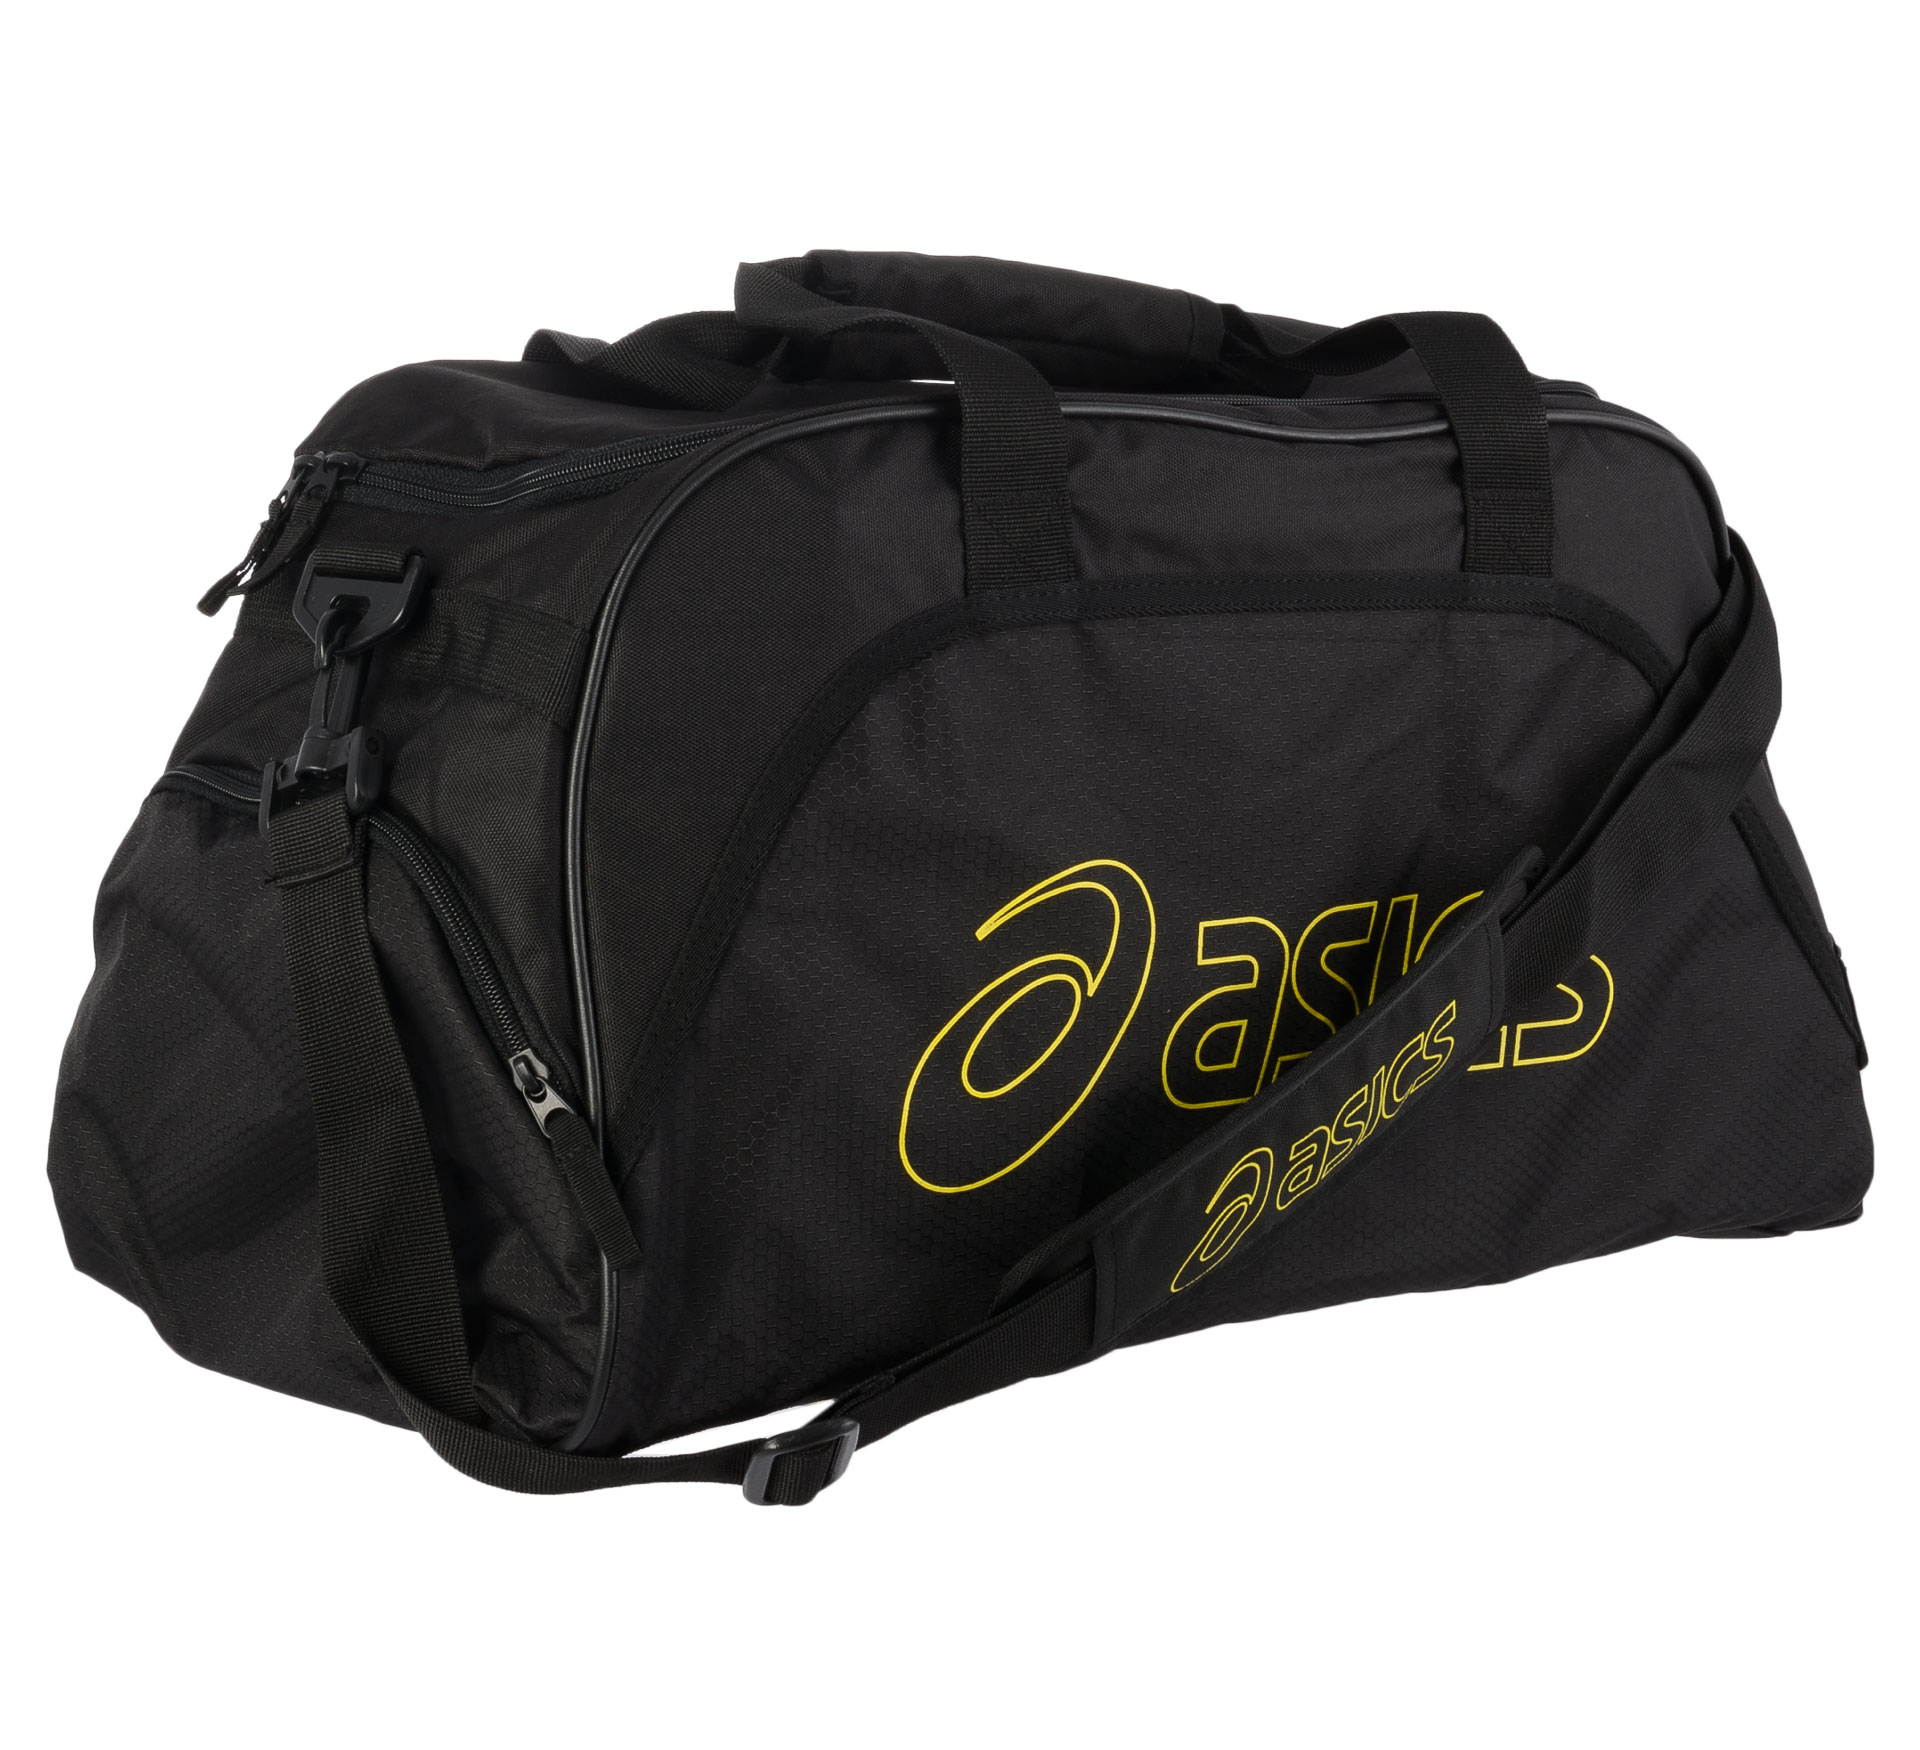 Asics  Medium Duffle Sporttas zwart - geel